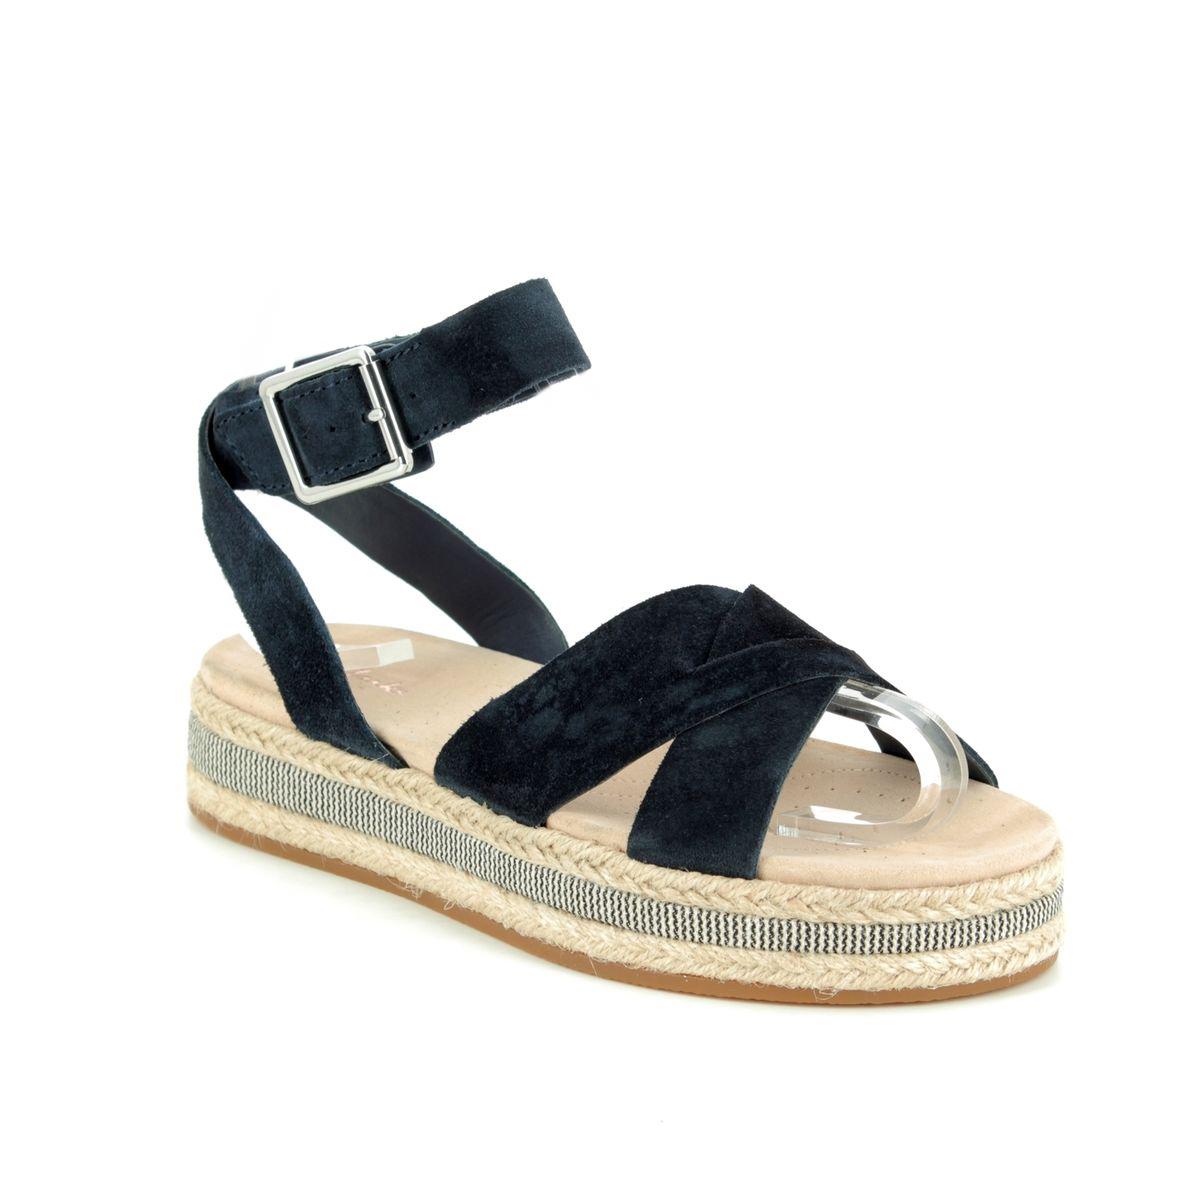 16d6cb380eae Clarks Flat Sandals - Navy - 392544D BOTANIC POPPY